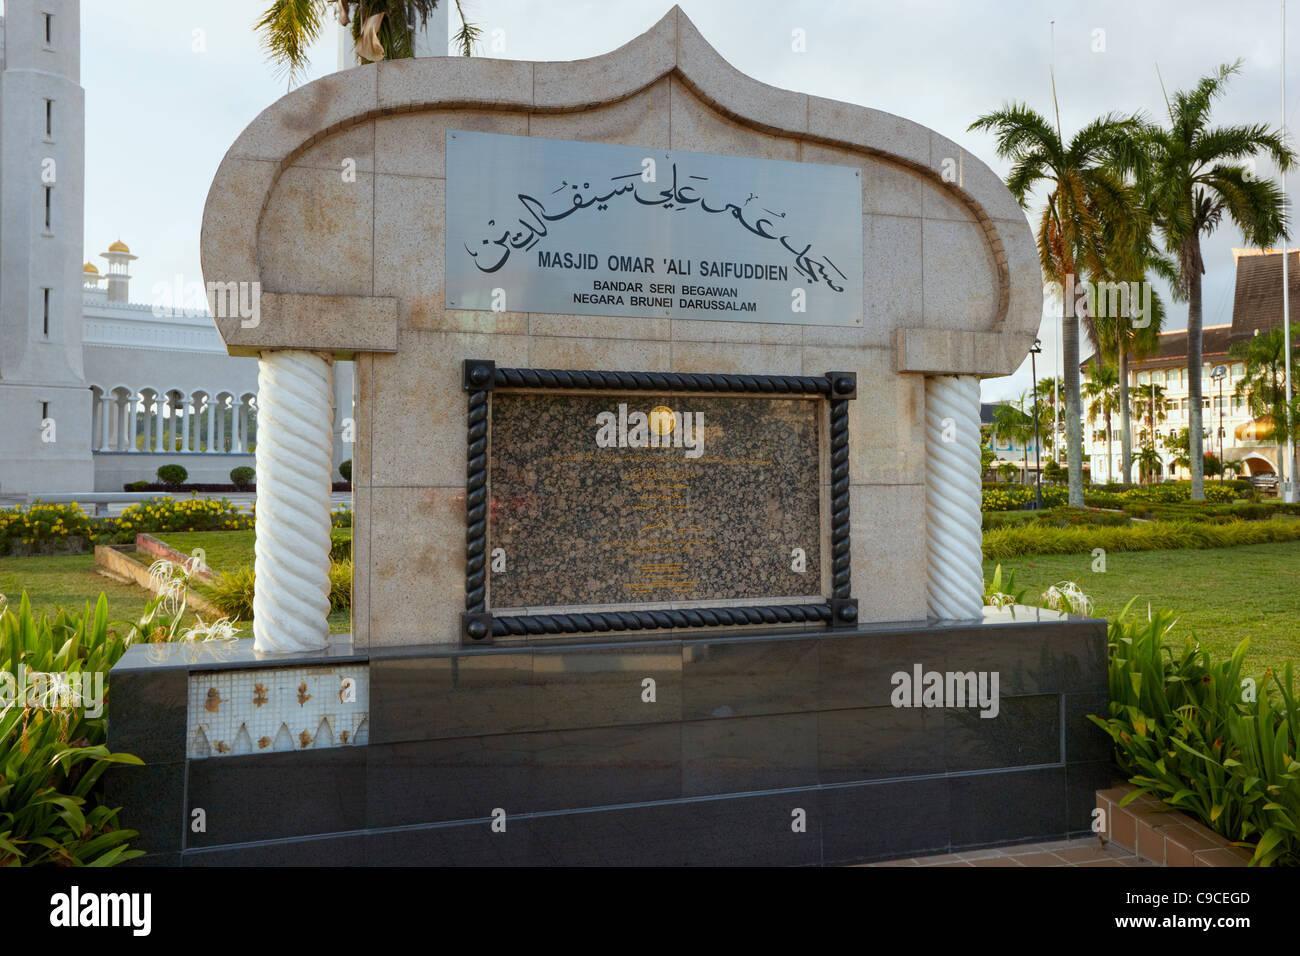 Omar Ali Saifuddien Mosque Plaque, Bandar Seri Begawan, Brunei Darussalam, Borneo, Asia - Stock Image